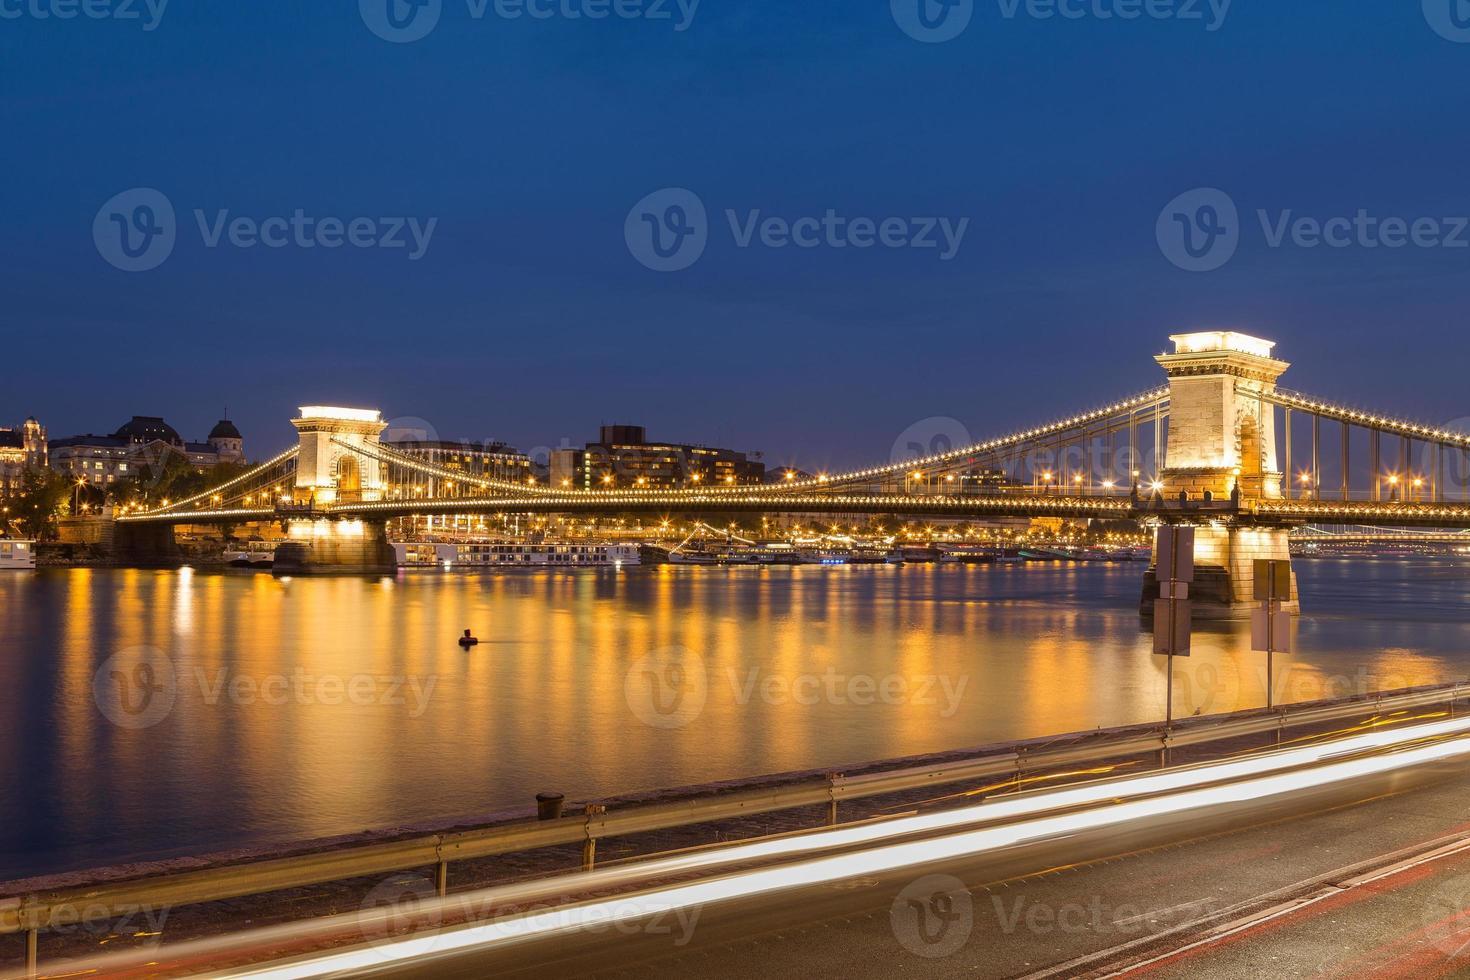 szechenyi kedjebro i Budapest på natten foto